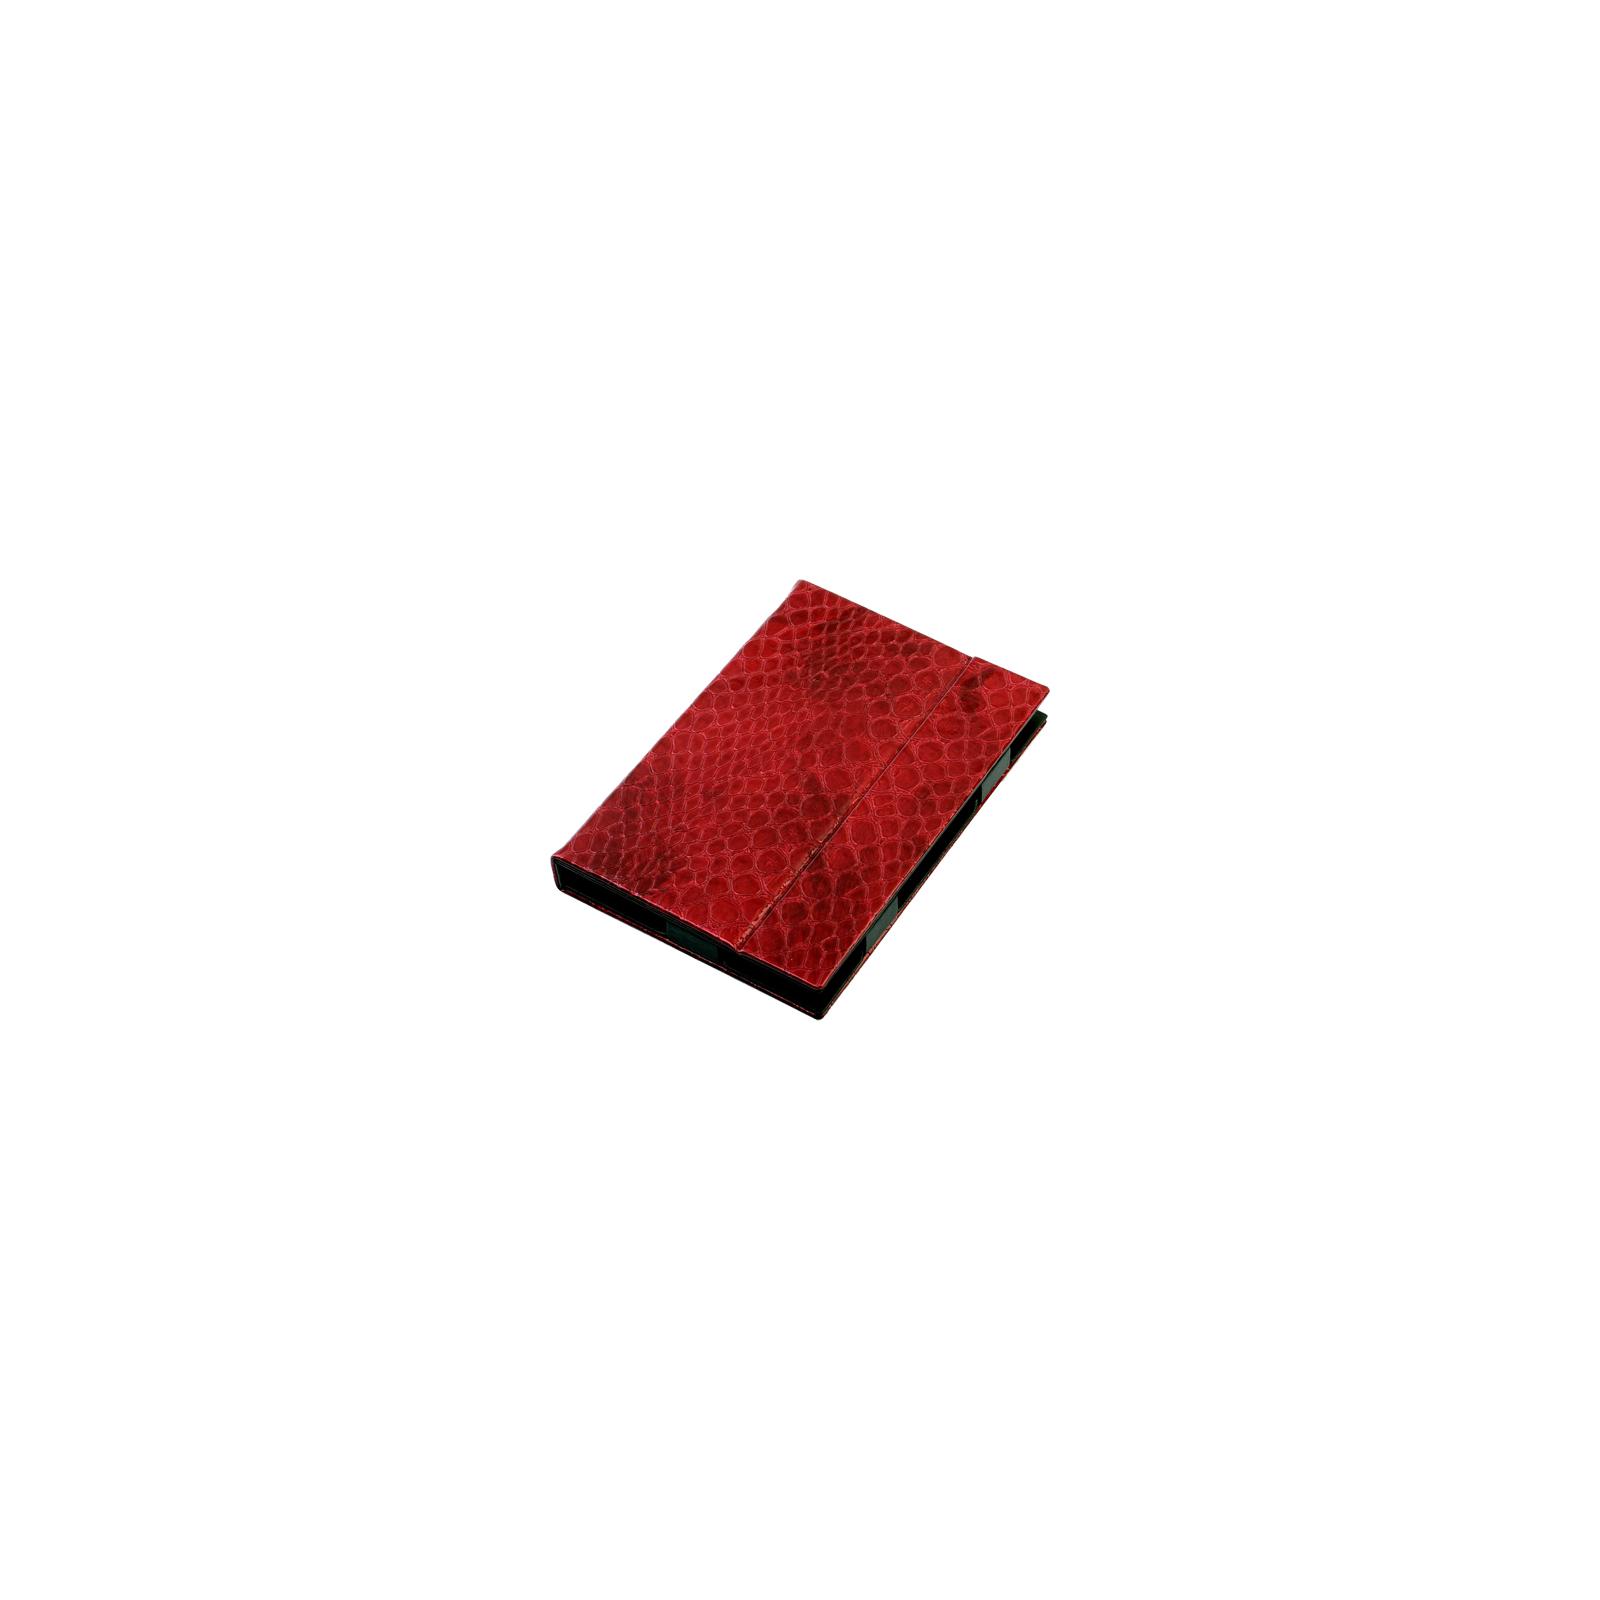 Чехол для планшета Vento 7 Desire glossy - red reptile